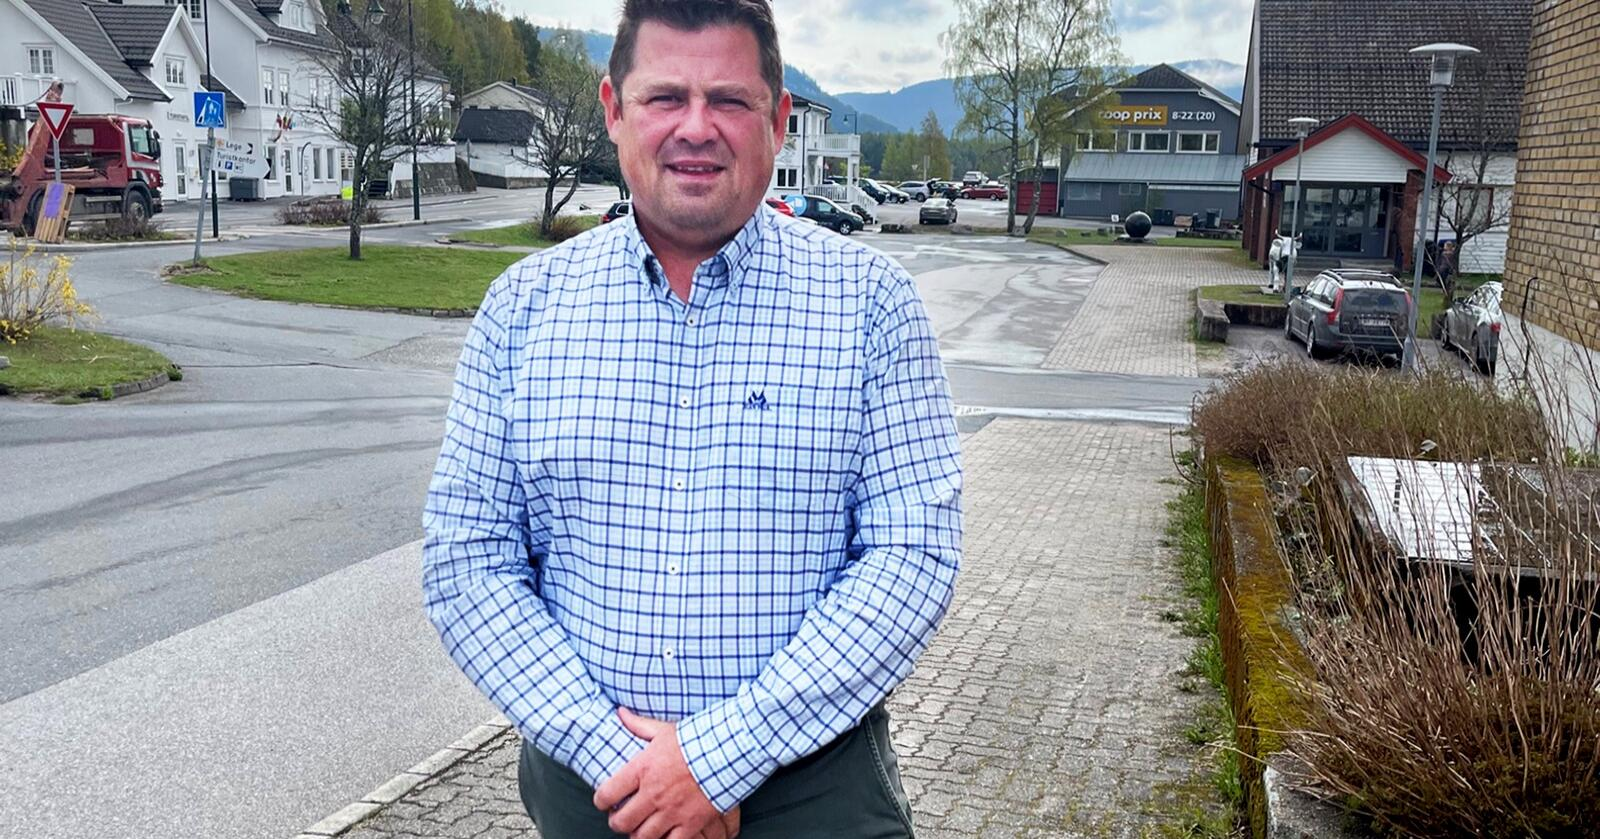 Ordfører i Nissedal kommune, Halvor Homme (Ap) er ikke en av ordførerne som reagerer negativt på at koronavaksiner skal skjevfordeles. Foto: Privat